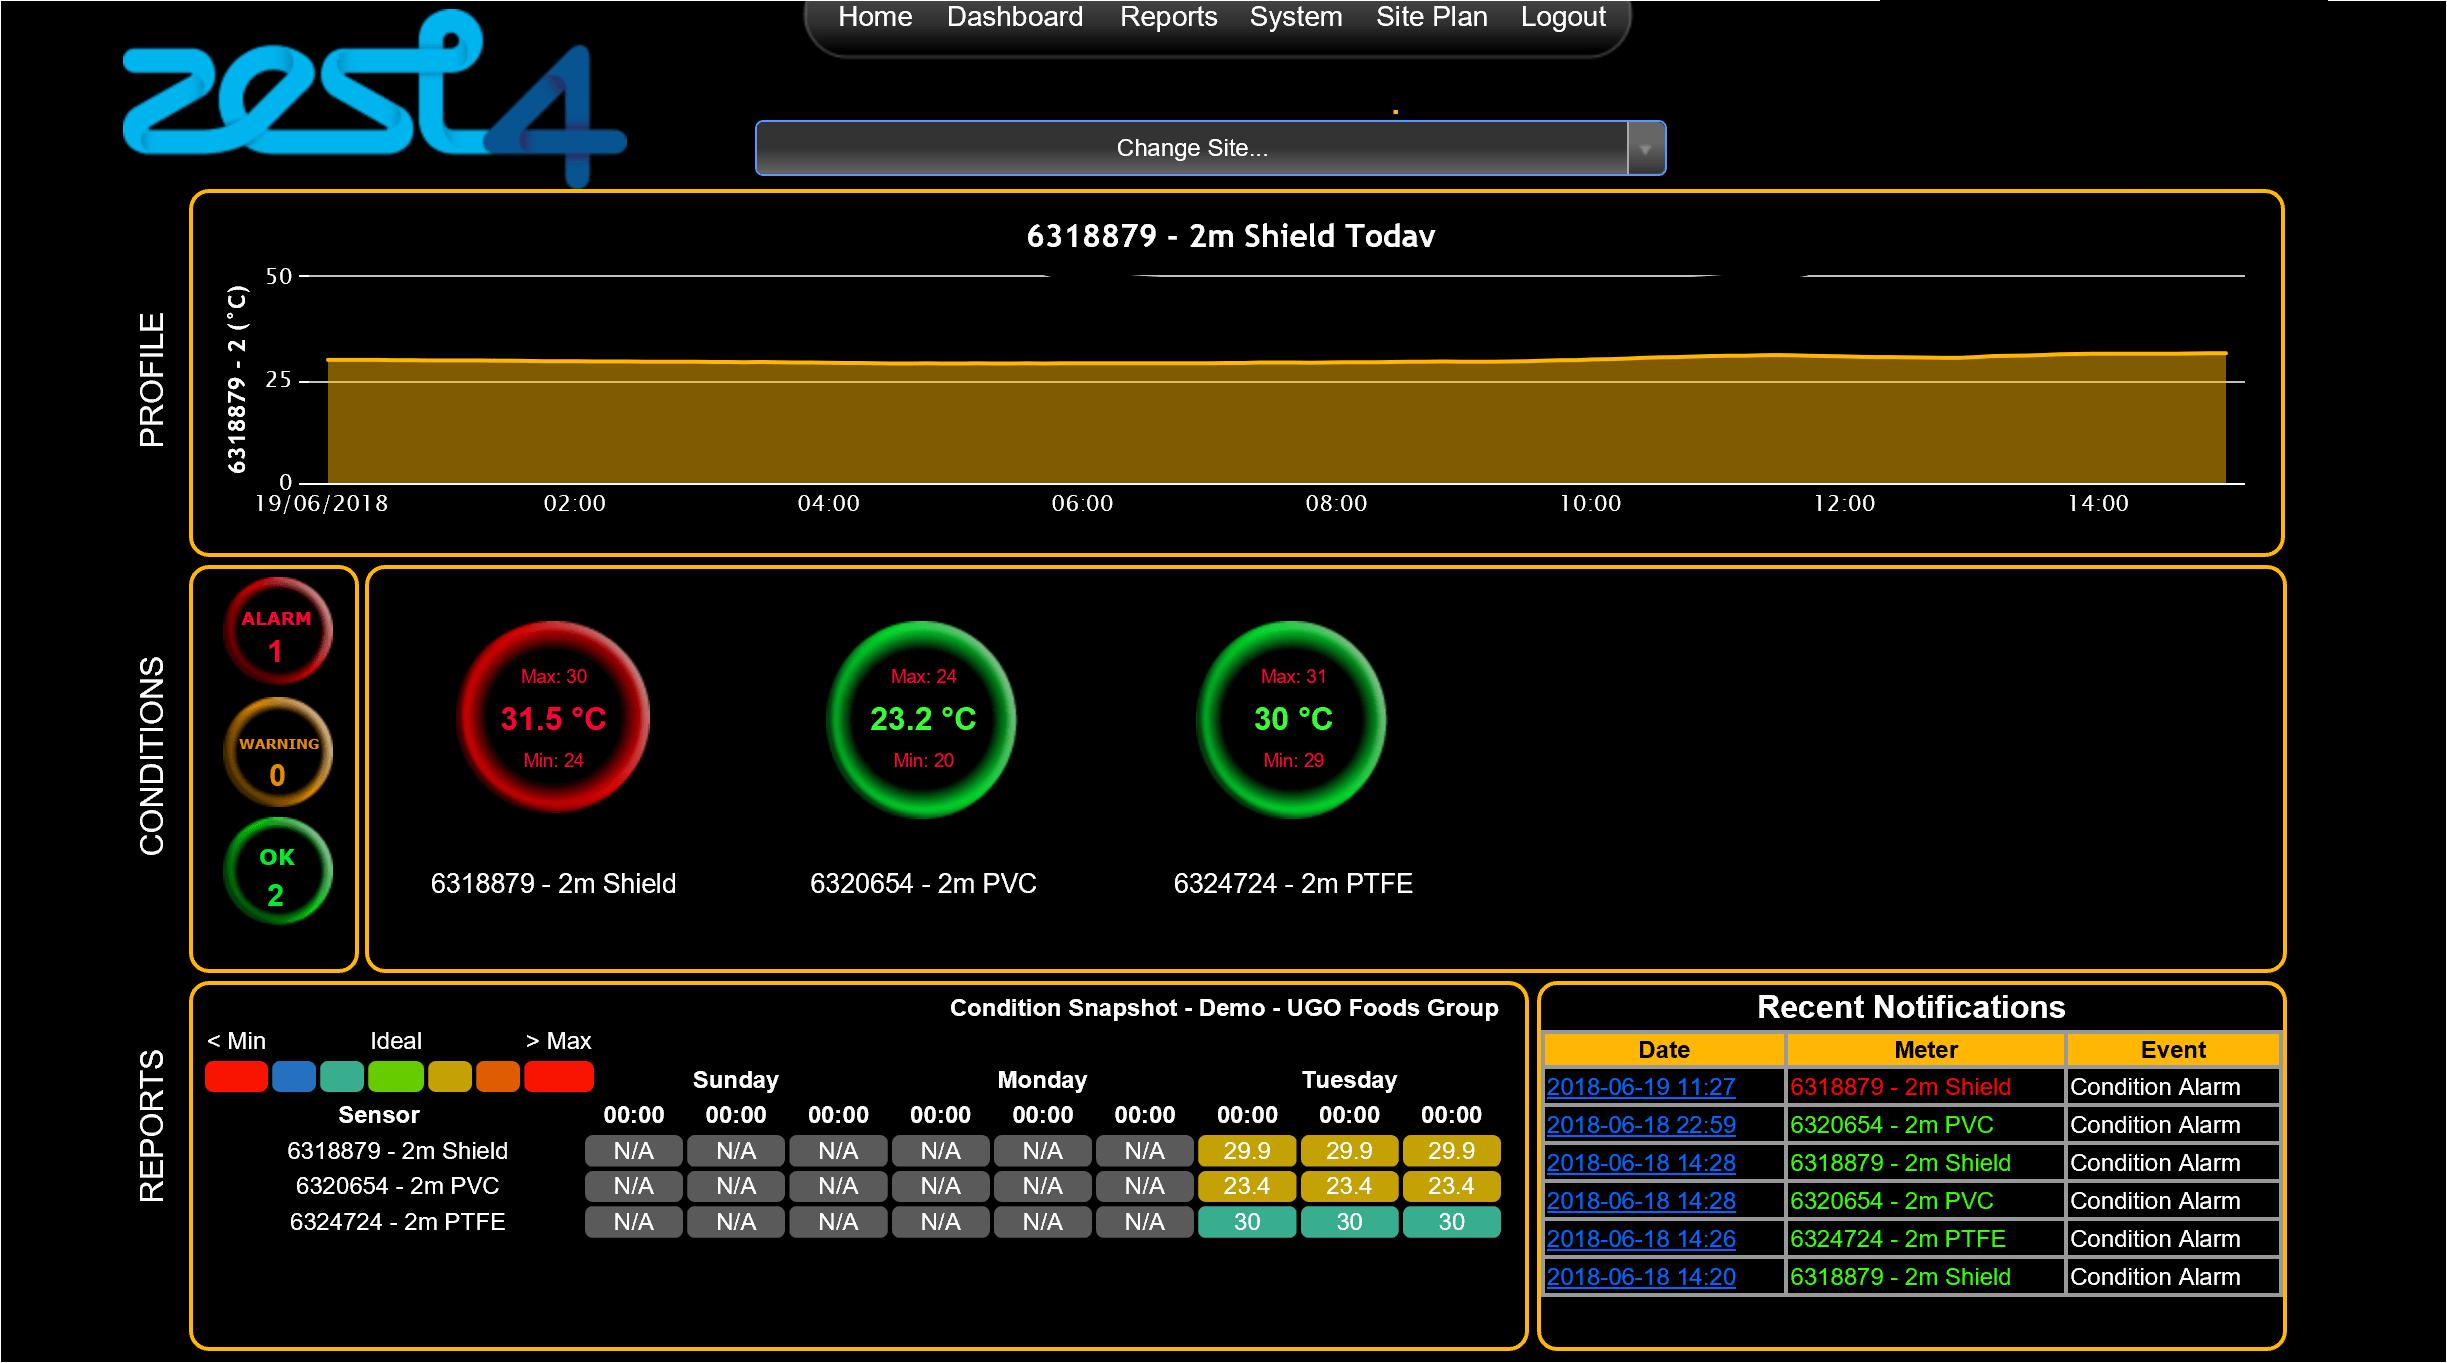 Zest4 Temperature Monitoring Dashboard Screenshot